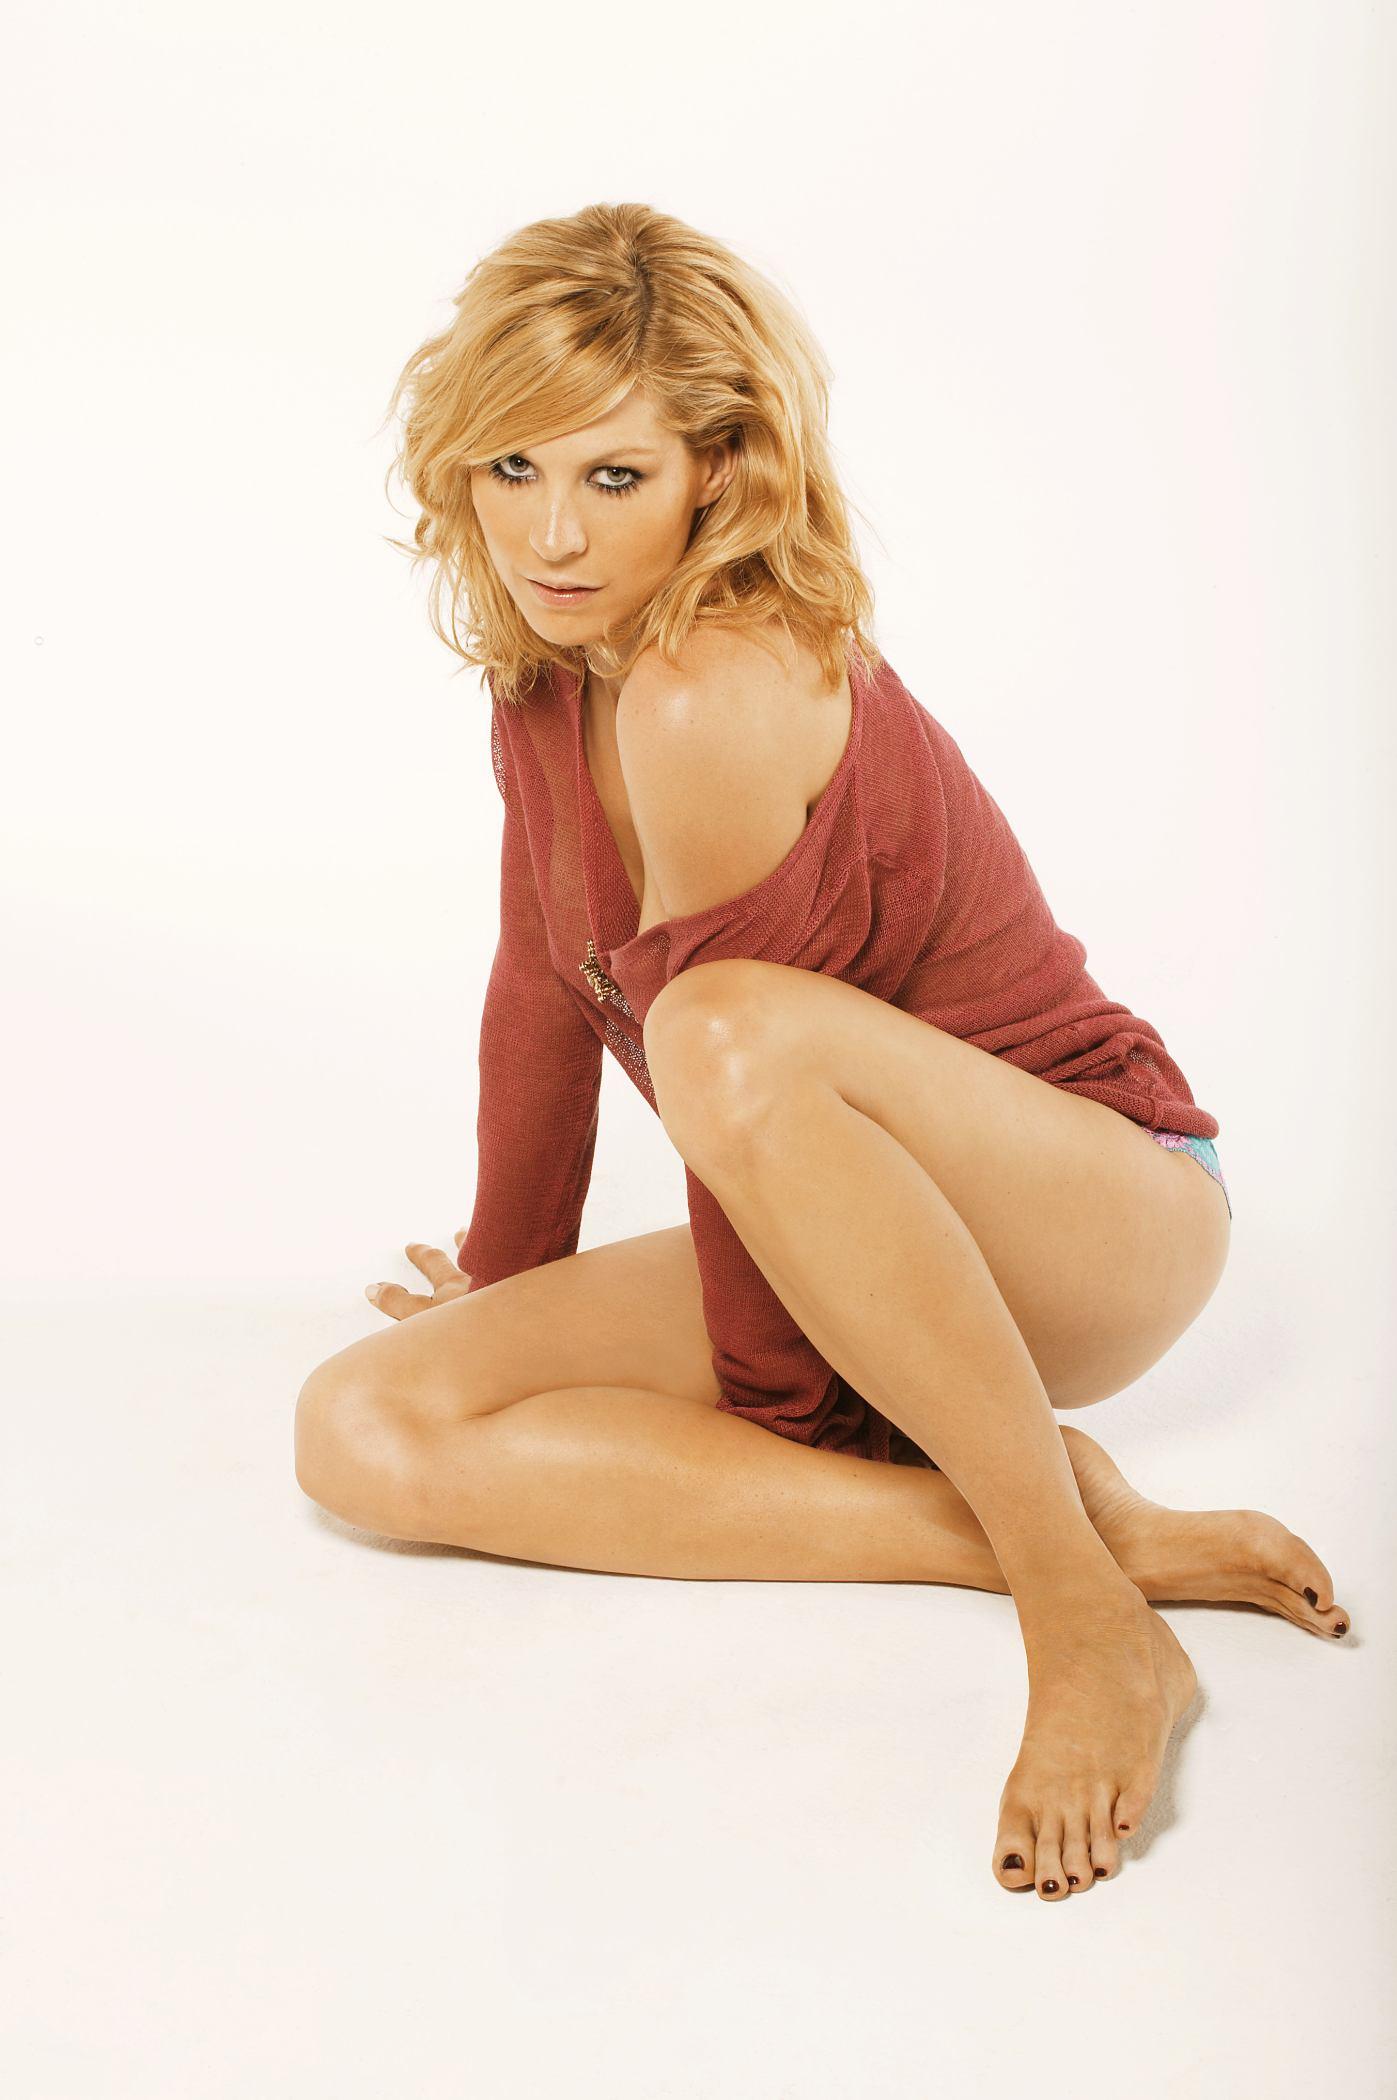 Jenna Elfman images Andrew Macpherson Photoshoot HD ...